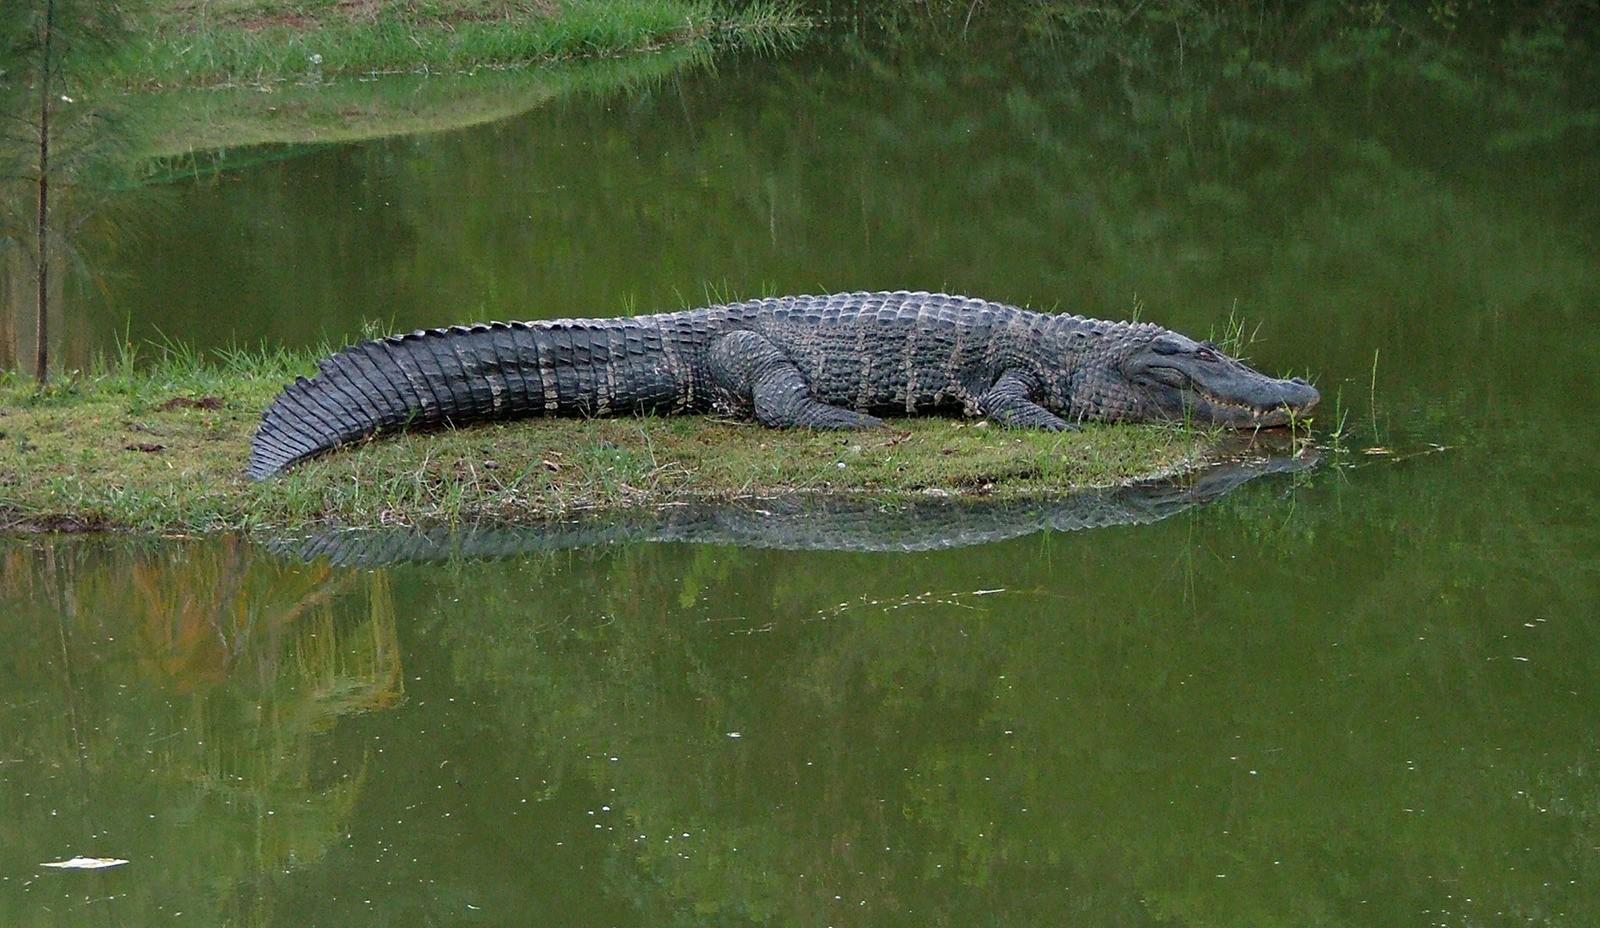 aligator-1399352-1600x1200